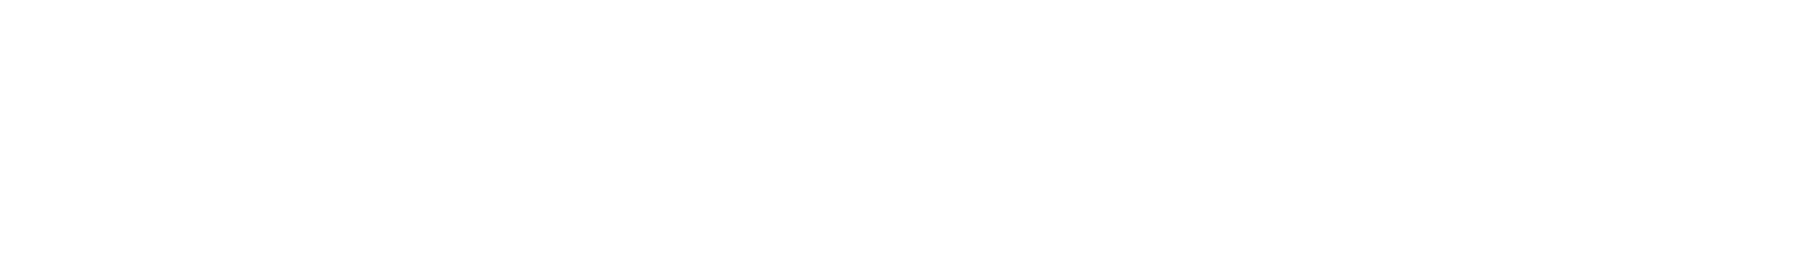 vedh bass cut 067 g